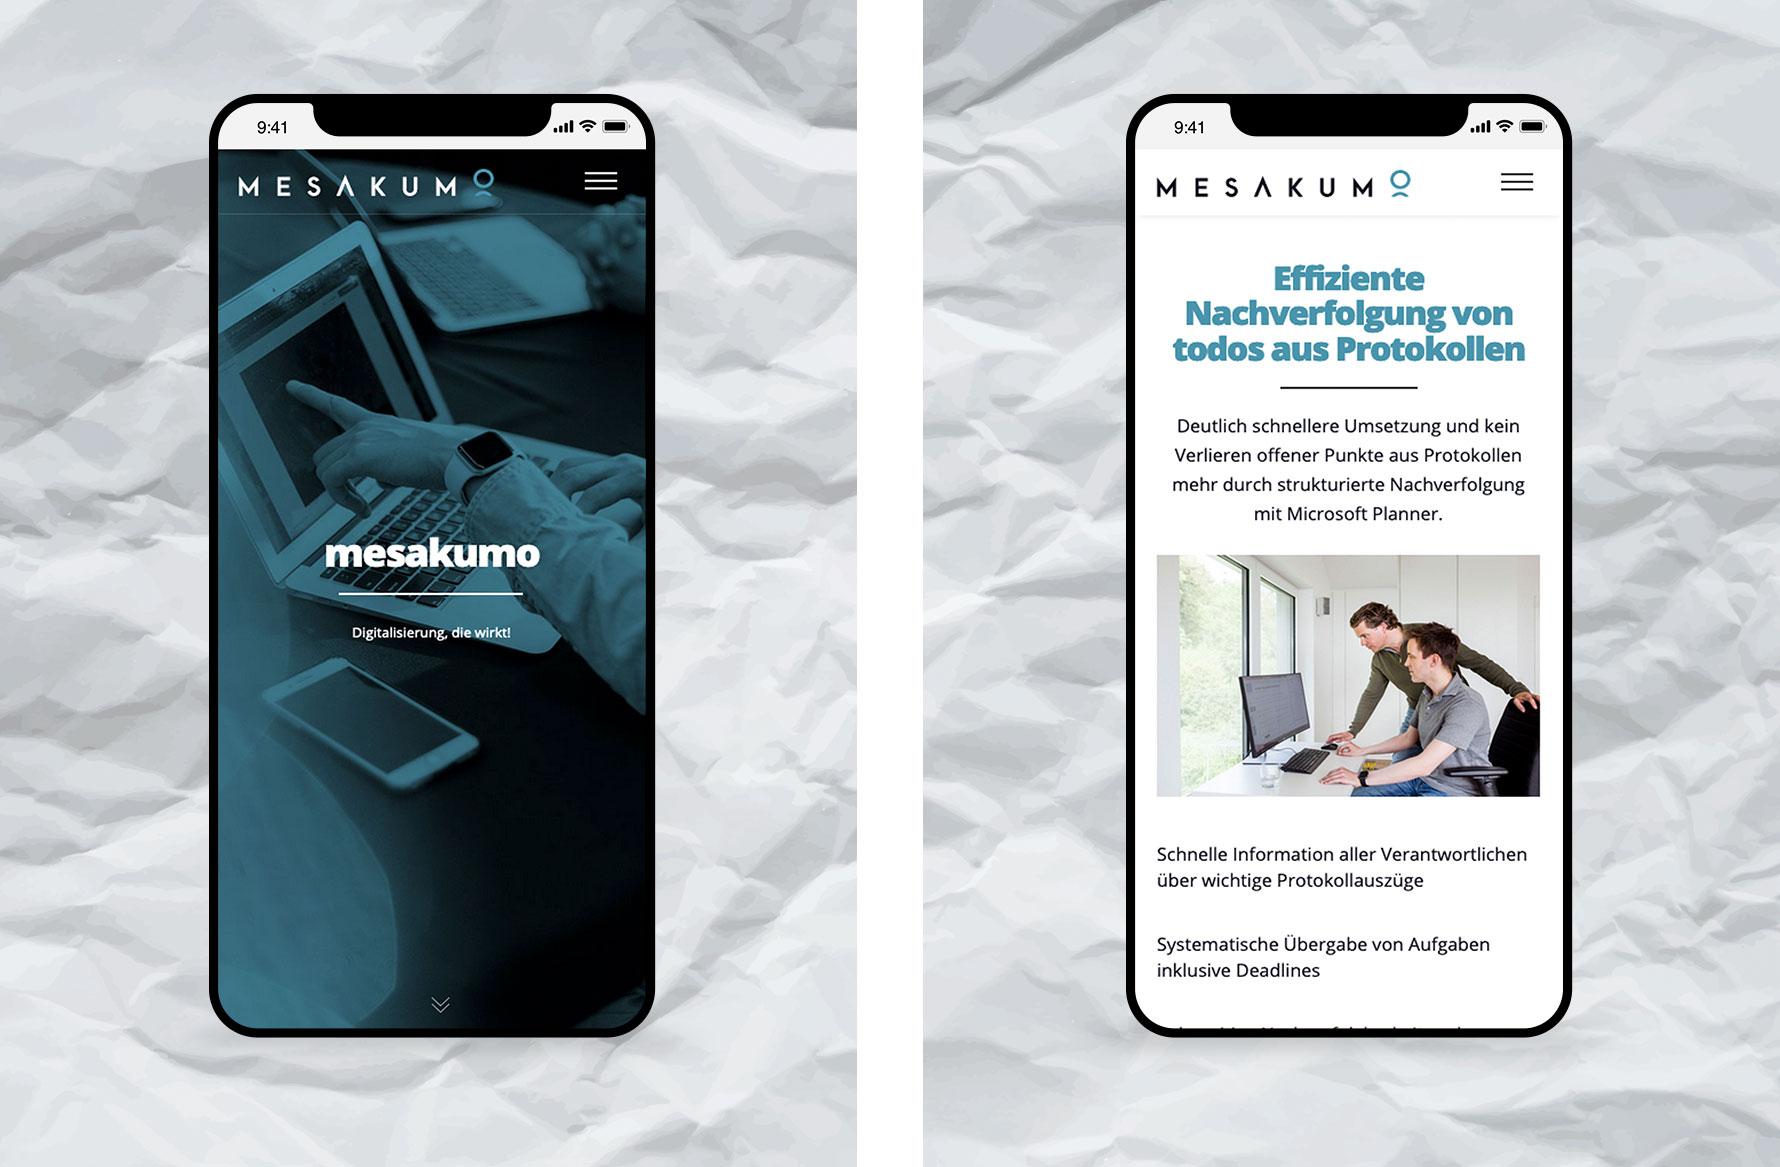 Hüfner Design | Referenz mesakumo | Webdesign, Mobile